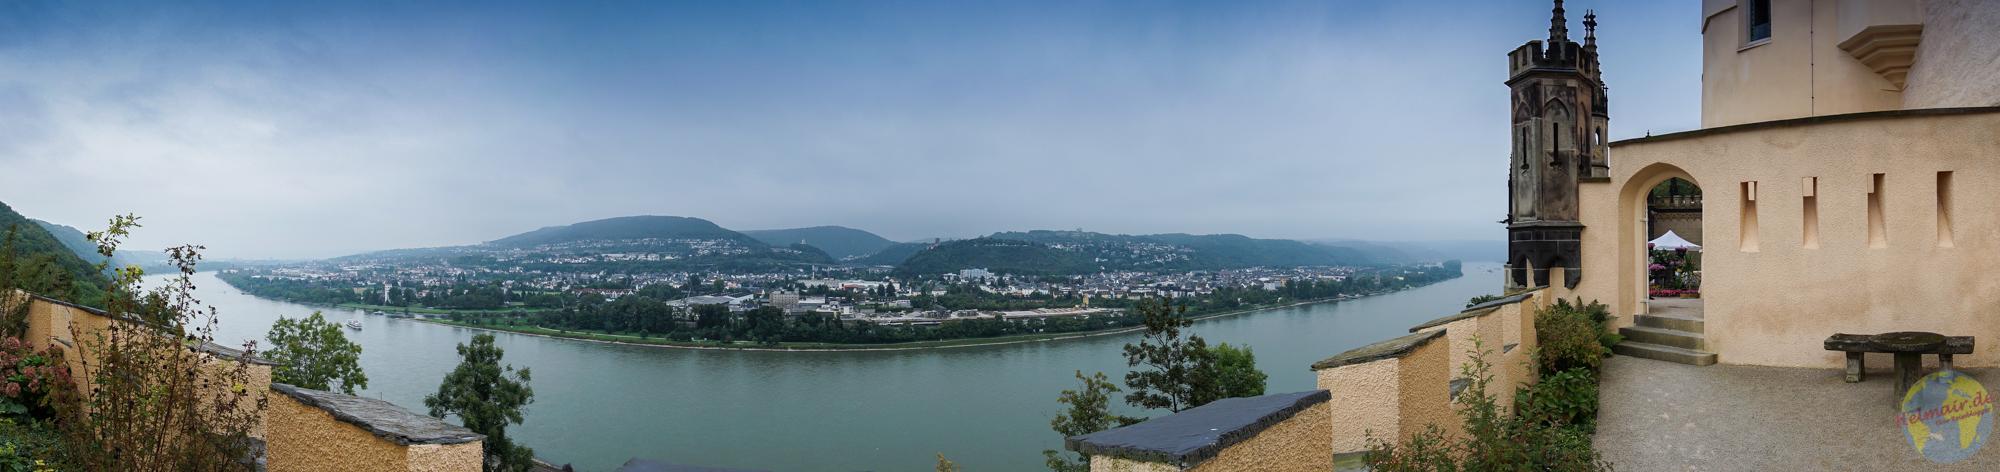 Panorama Lahnstein